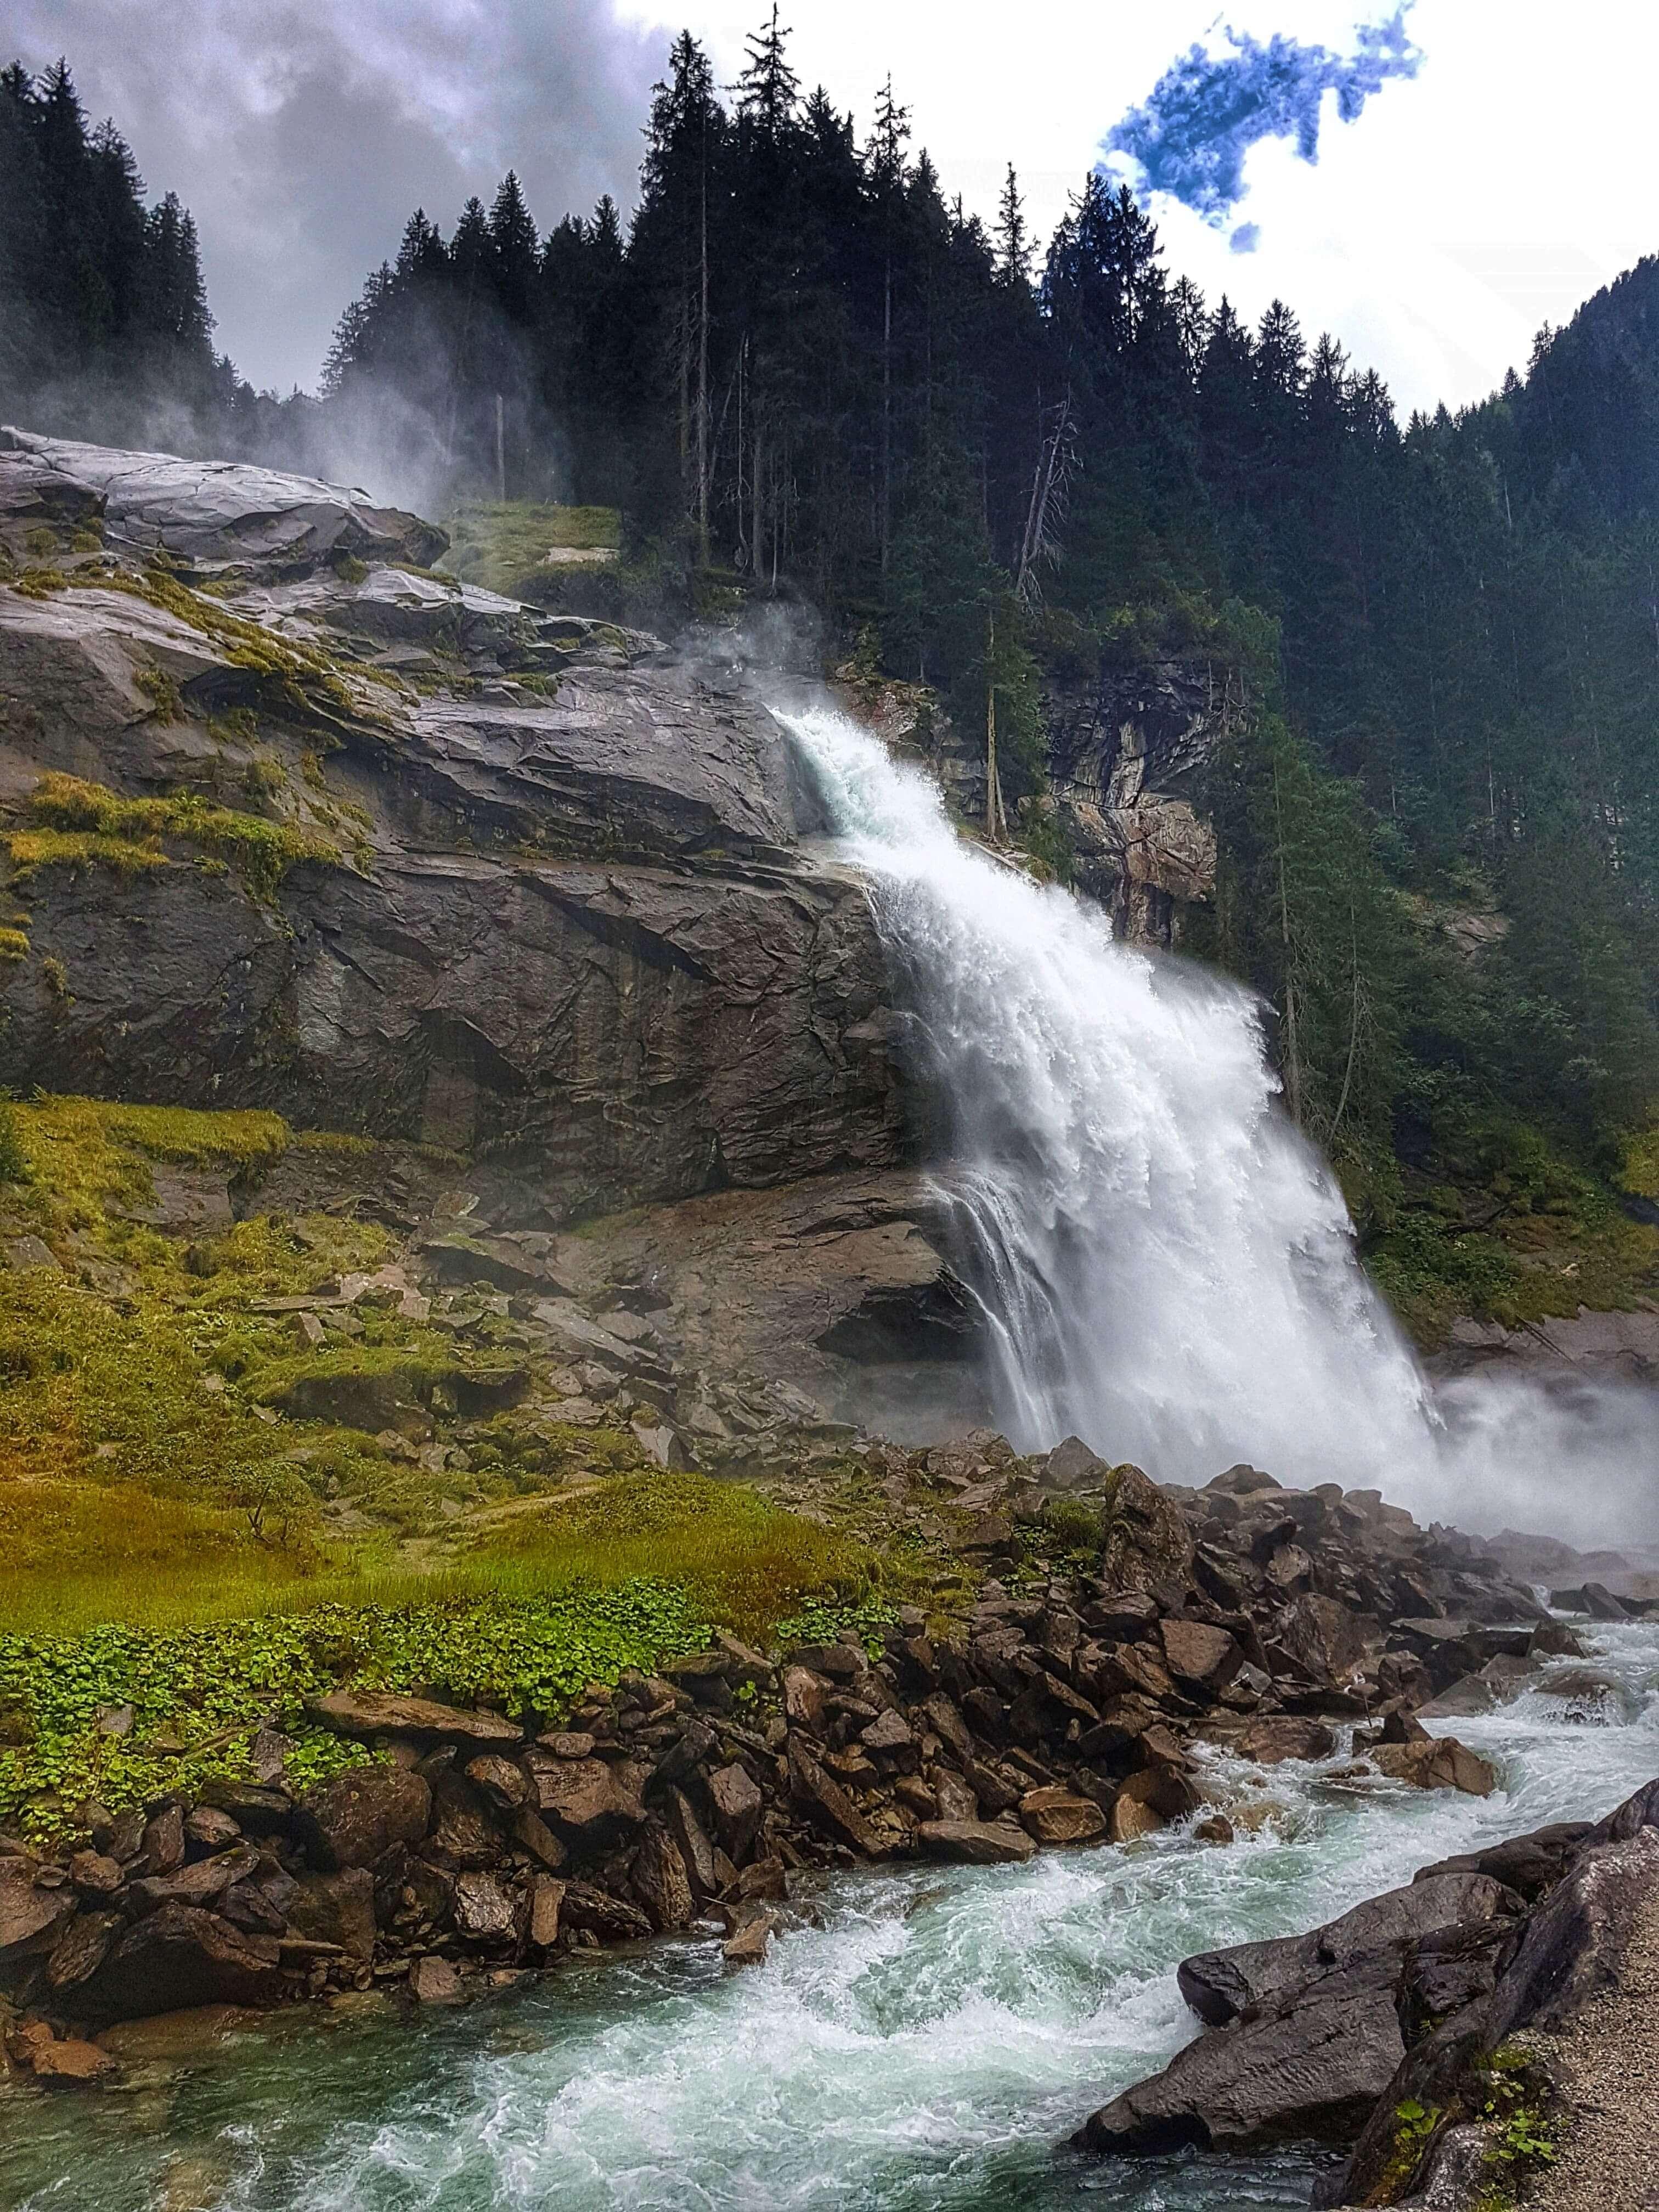 Krimmler Wasserfälle - Fotoparade 02/17 - Salty toes Reiseblog